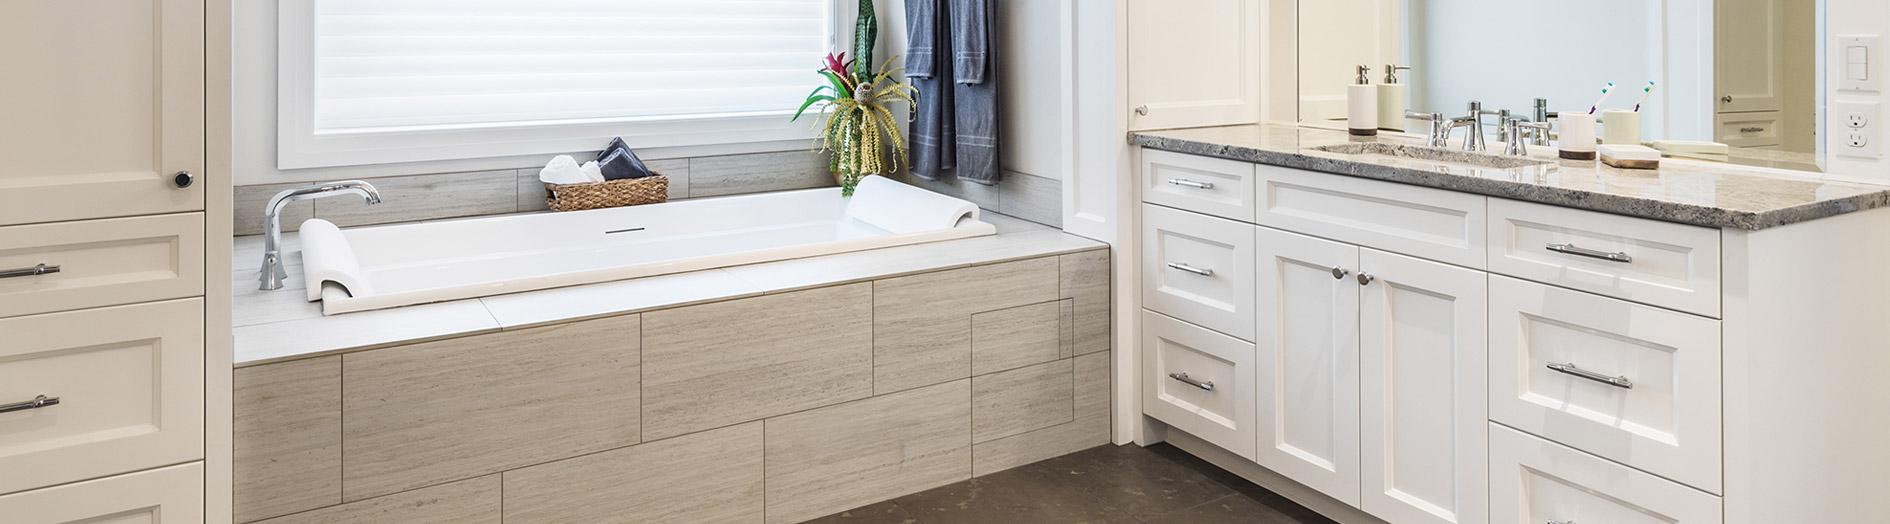 Custom-bathroom-cabinets.jpg